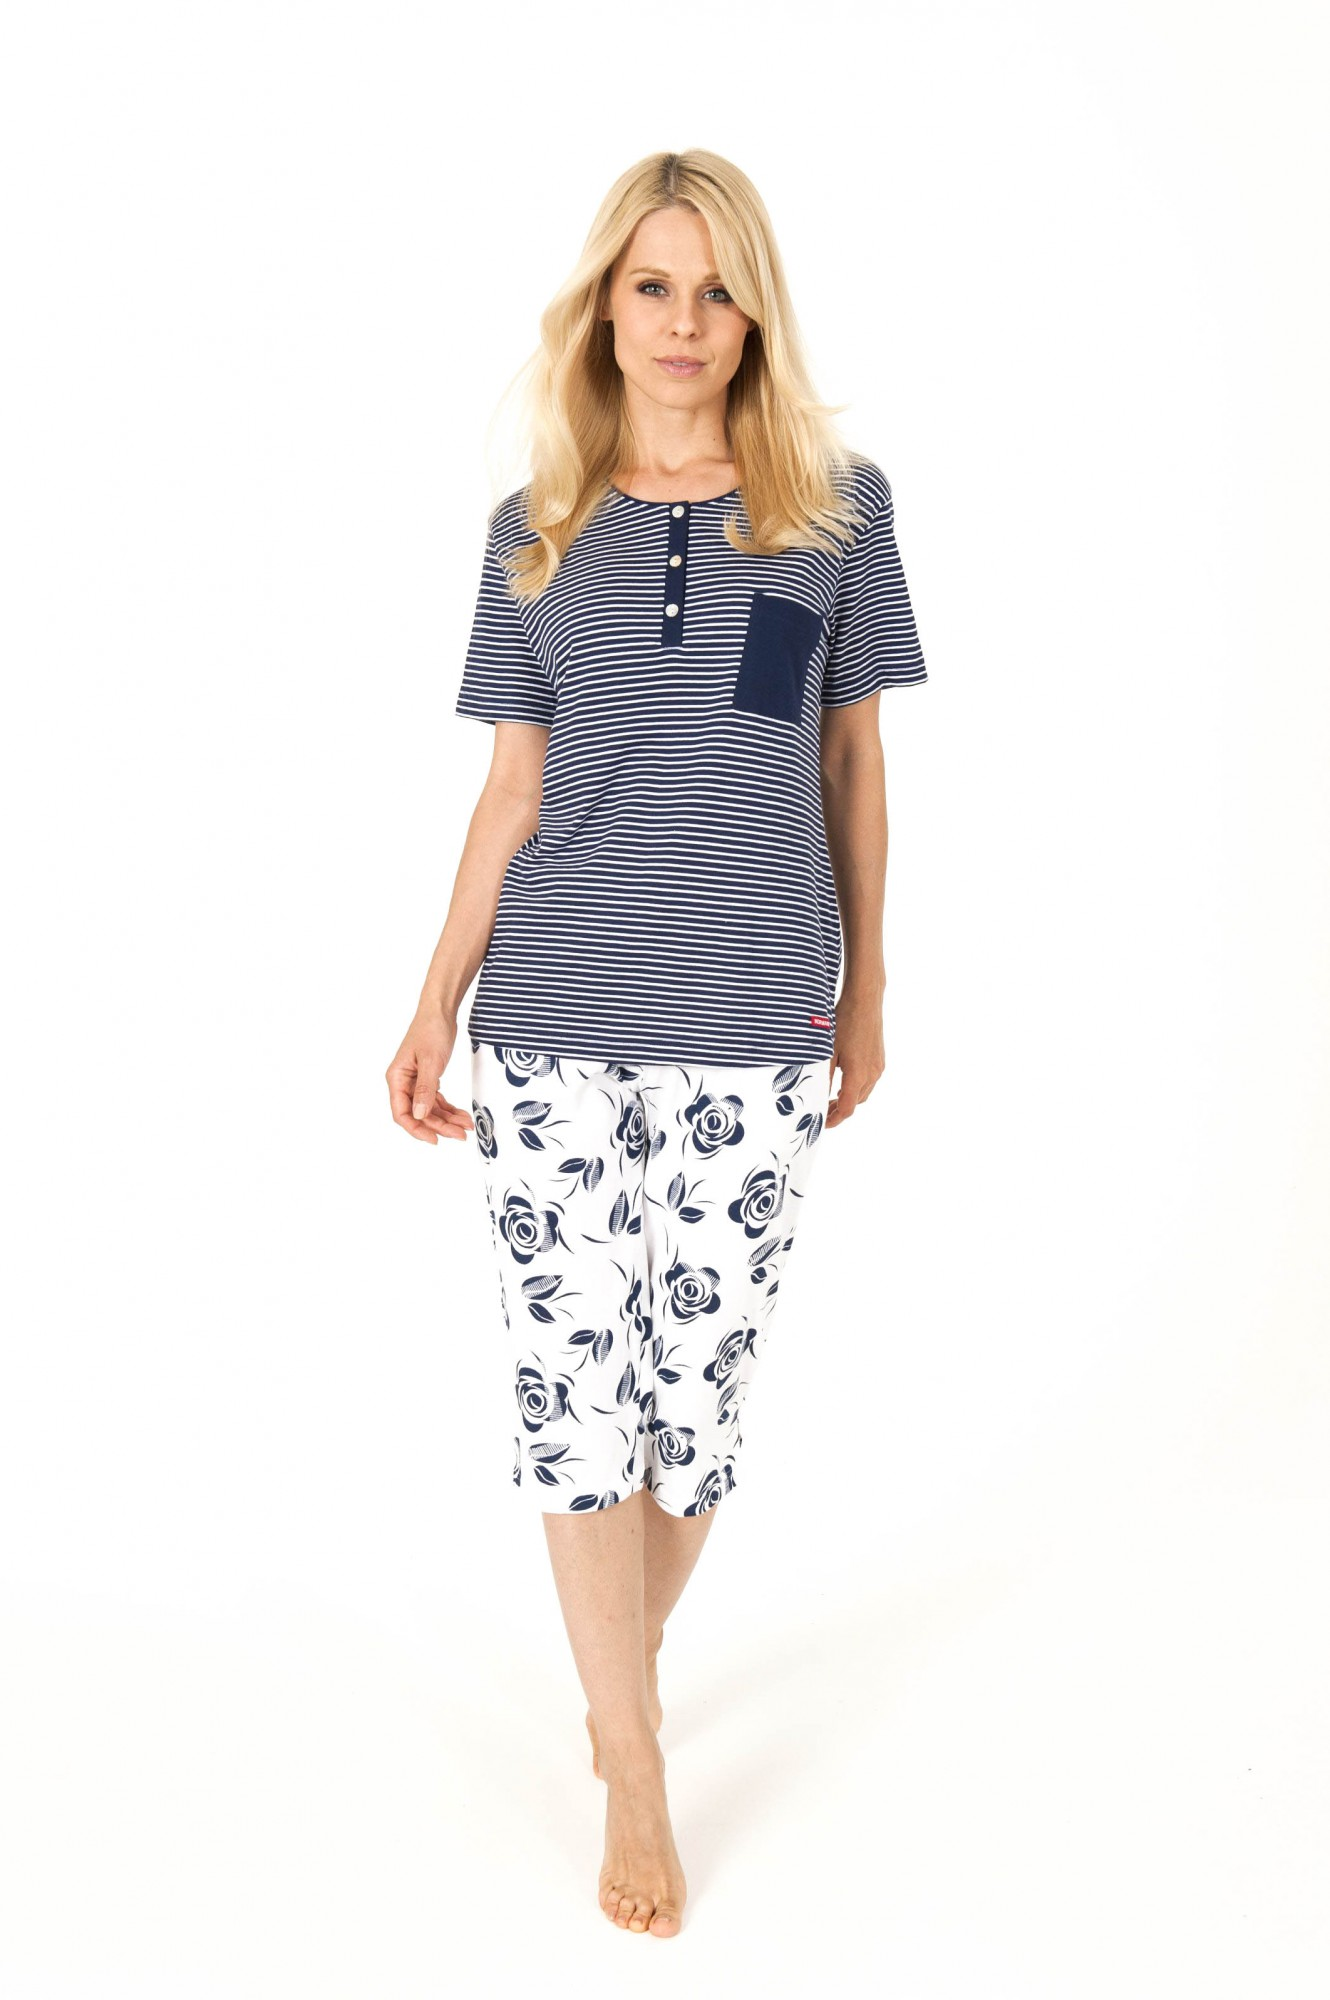 Damen Capri-Pyjama kurzarm – auch Grösse 32/34 und Übergrösse bis 60/62  - 204 90 881